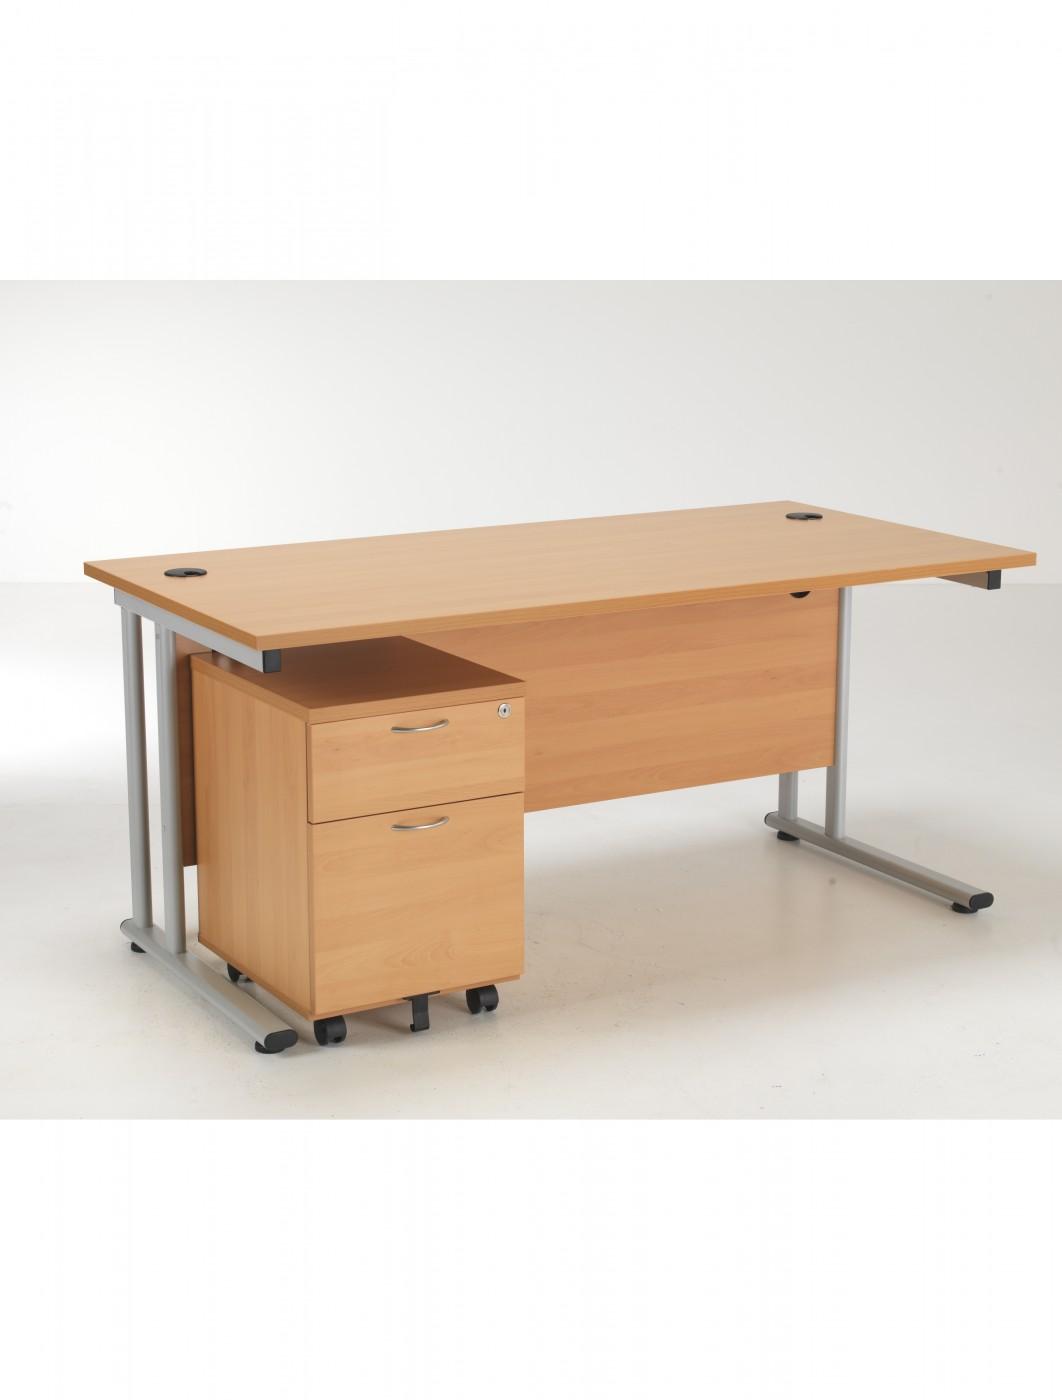 Tc Desk And Pedestal Lite1680bund2be 121 Office Furniture